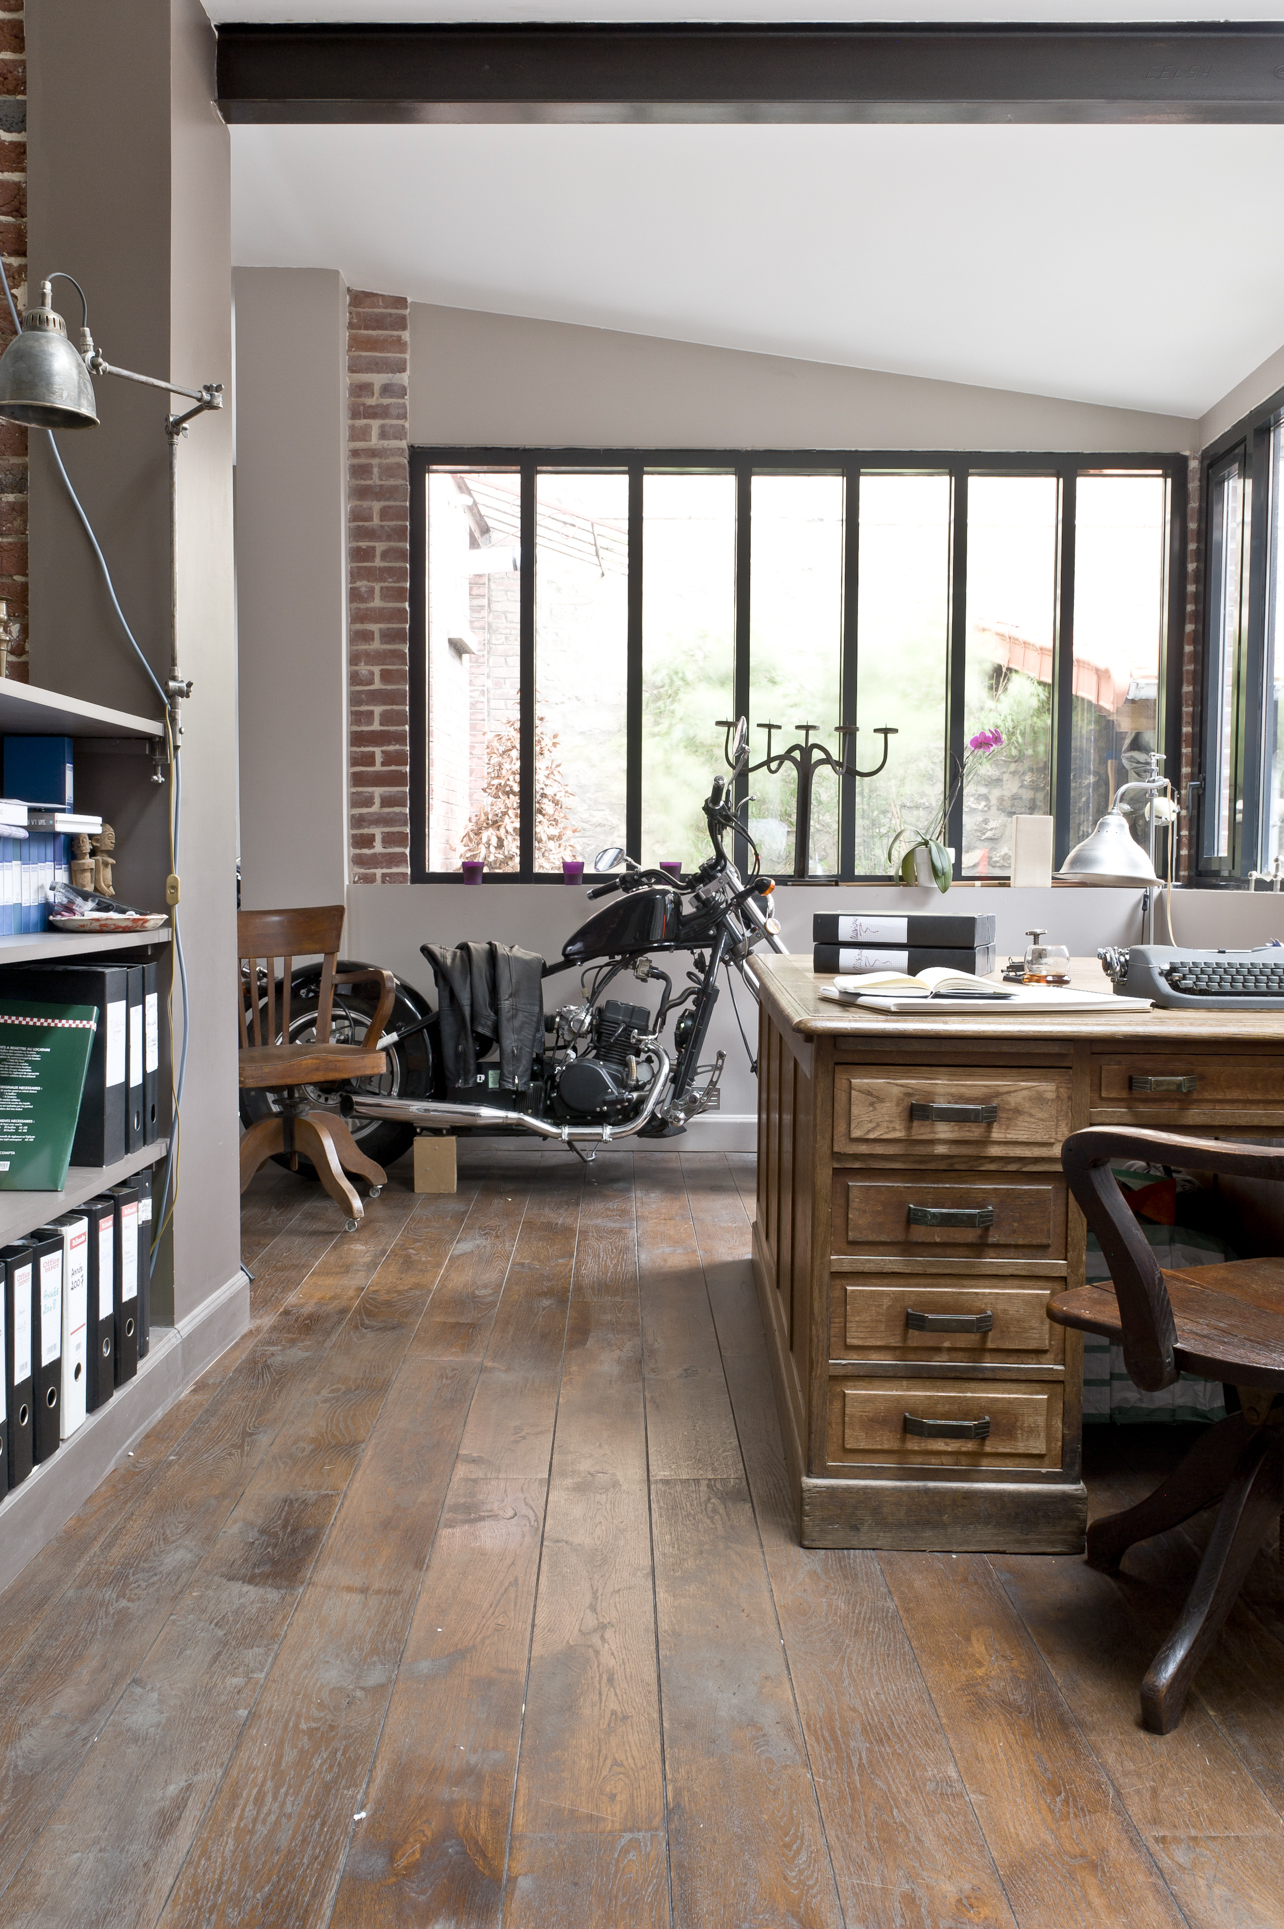 catalogue ripolin marion alberge d coratrice d 39 int rieur paris. Black Bedroom Furniture Sets. Home Design Ideas